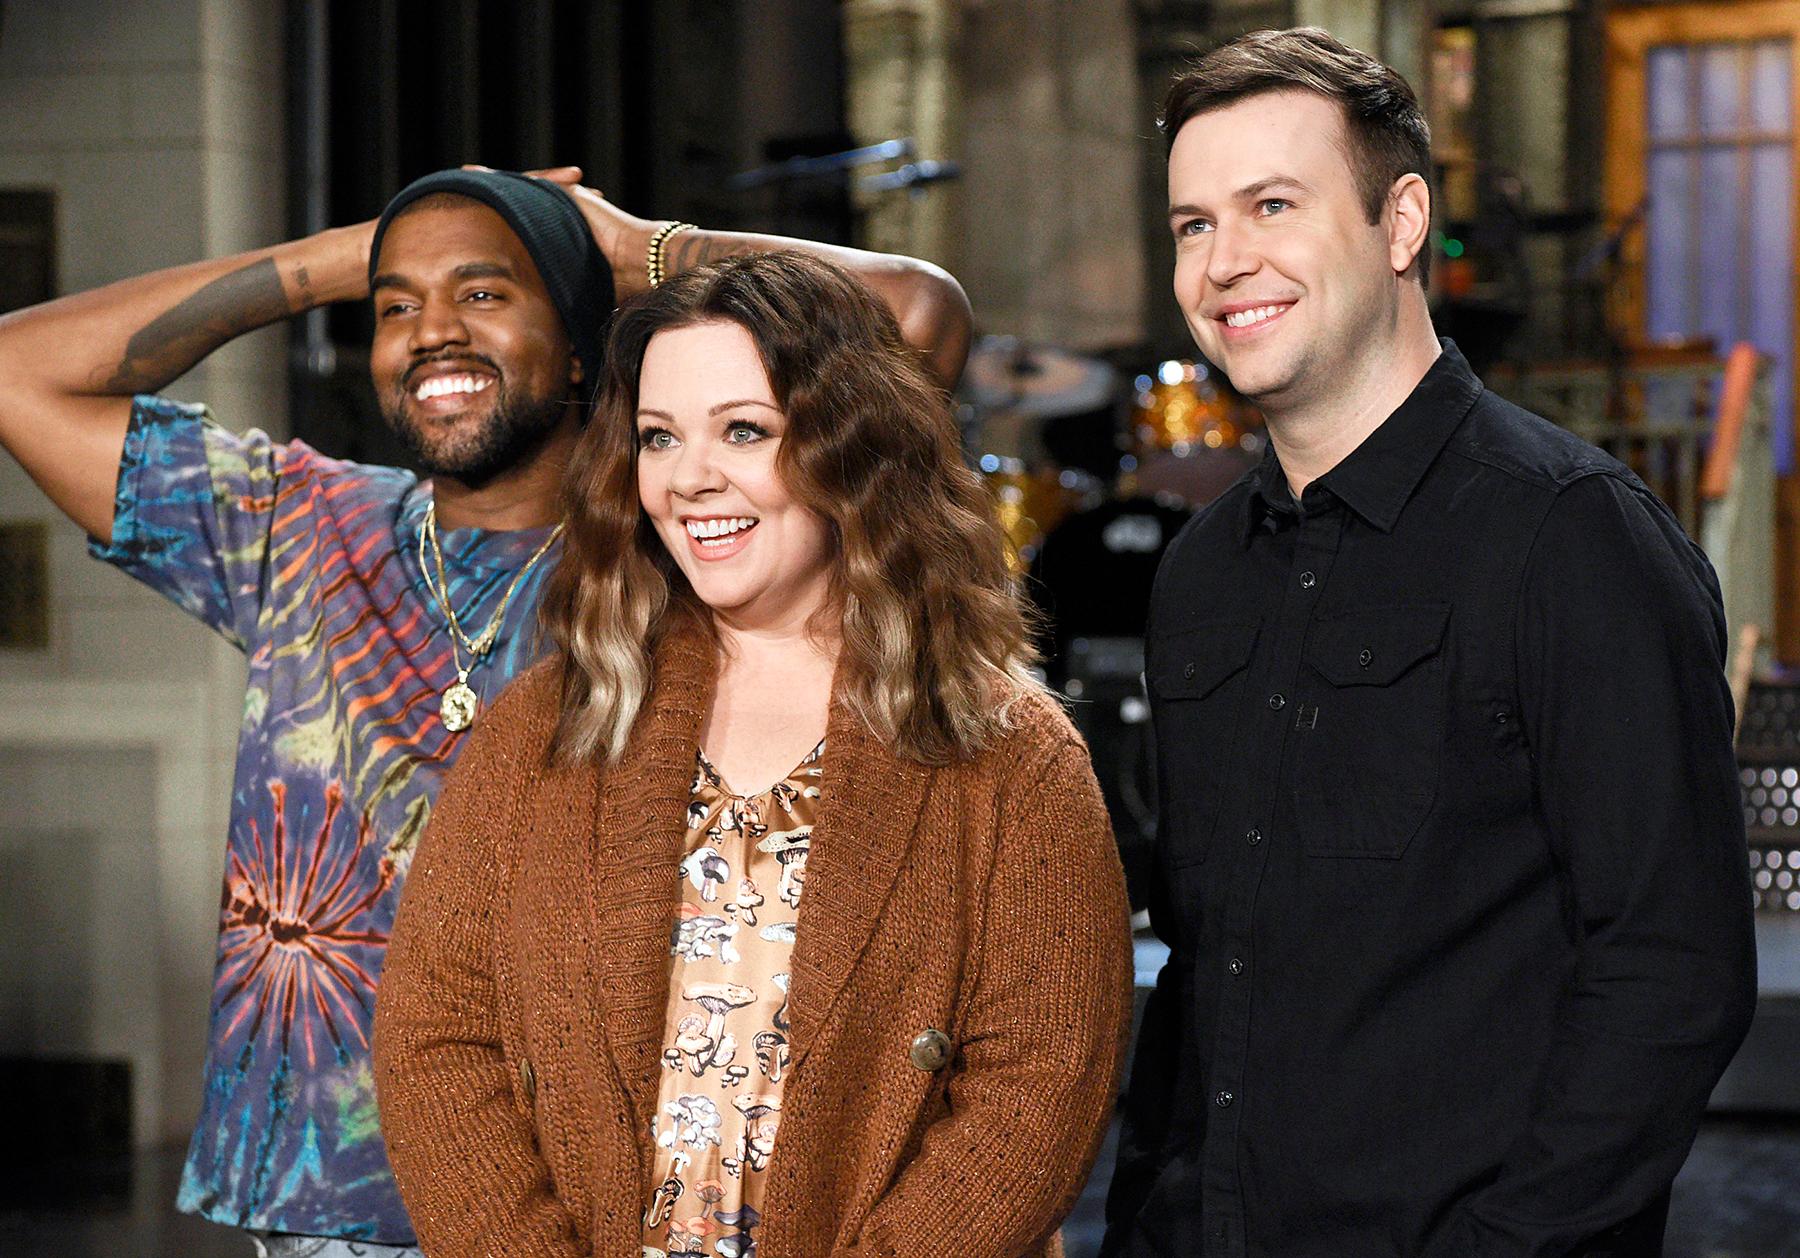 Kanye West on Saturday Night Live